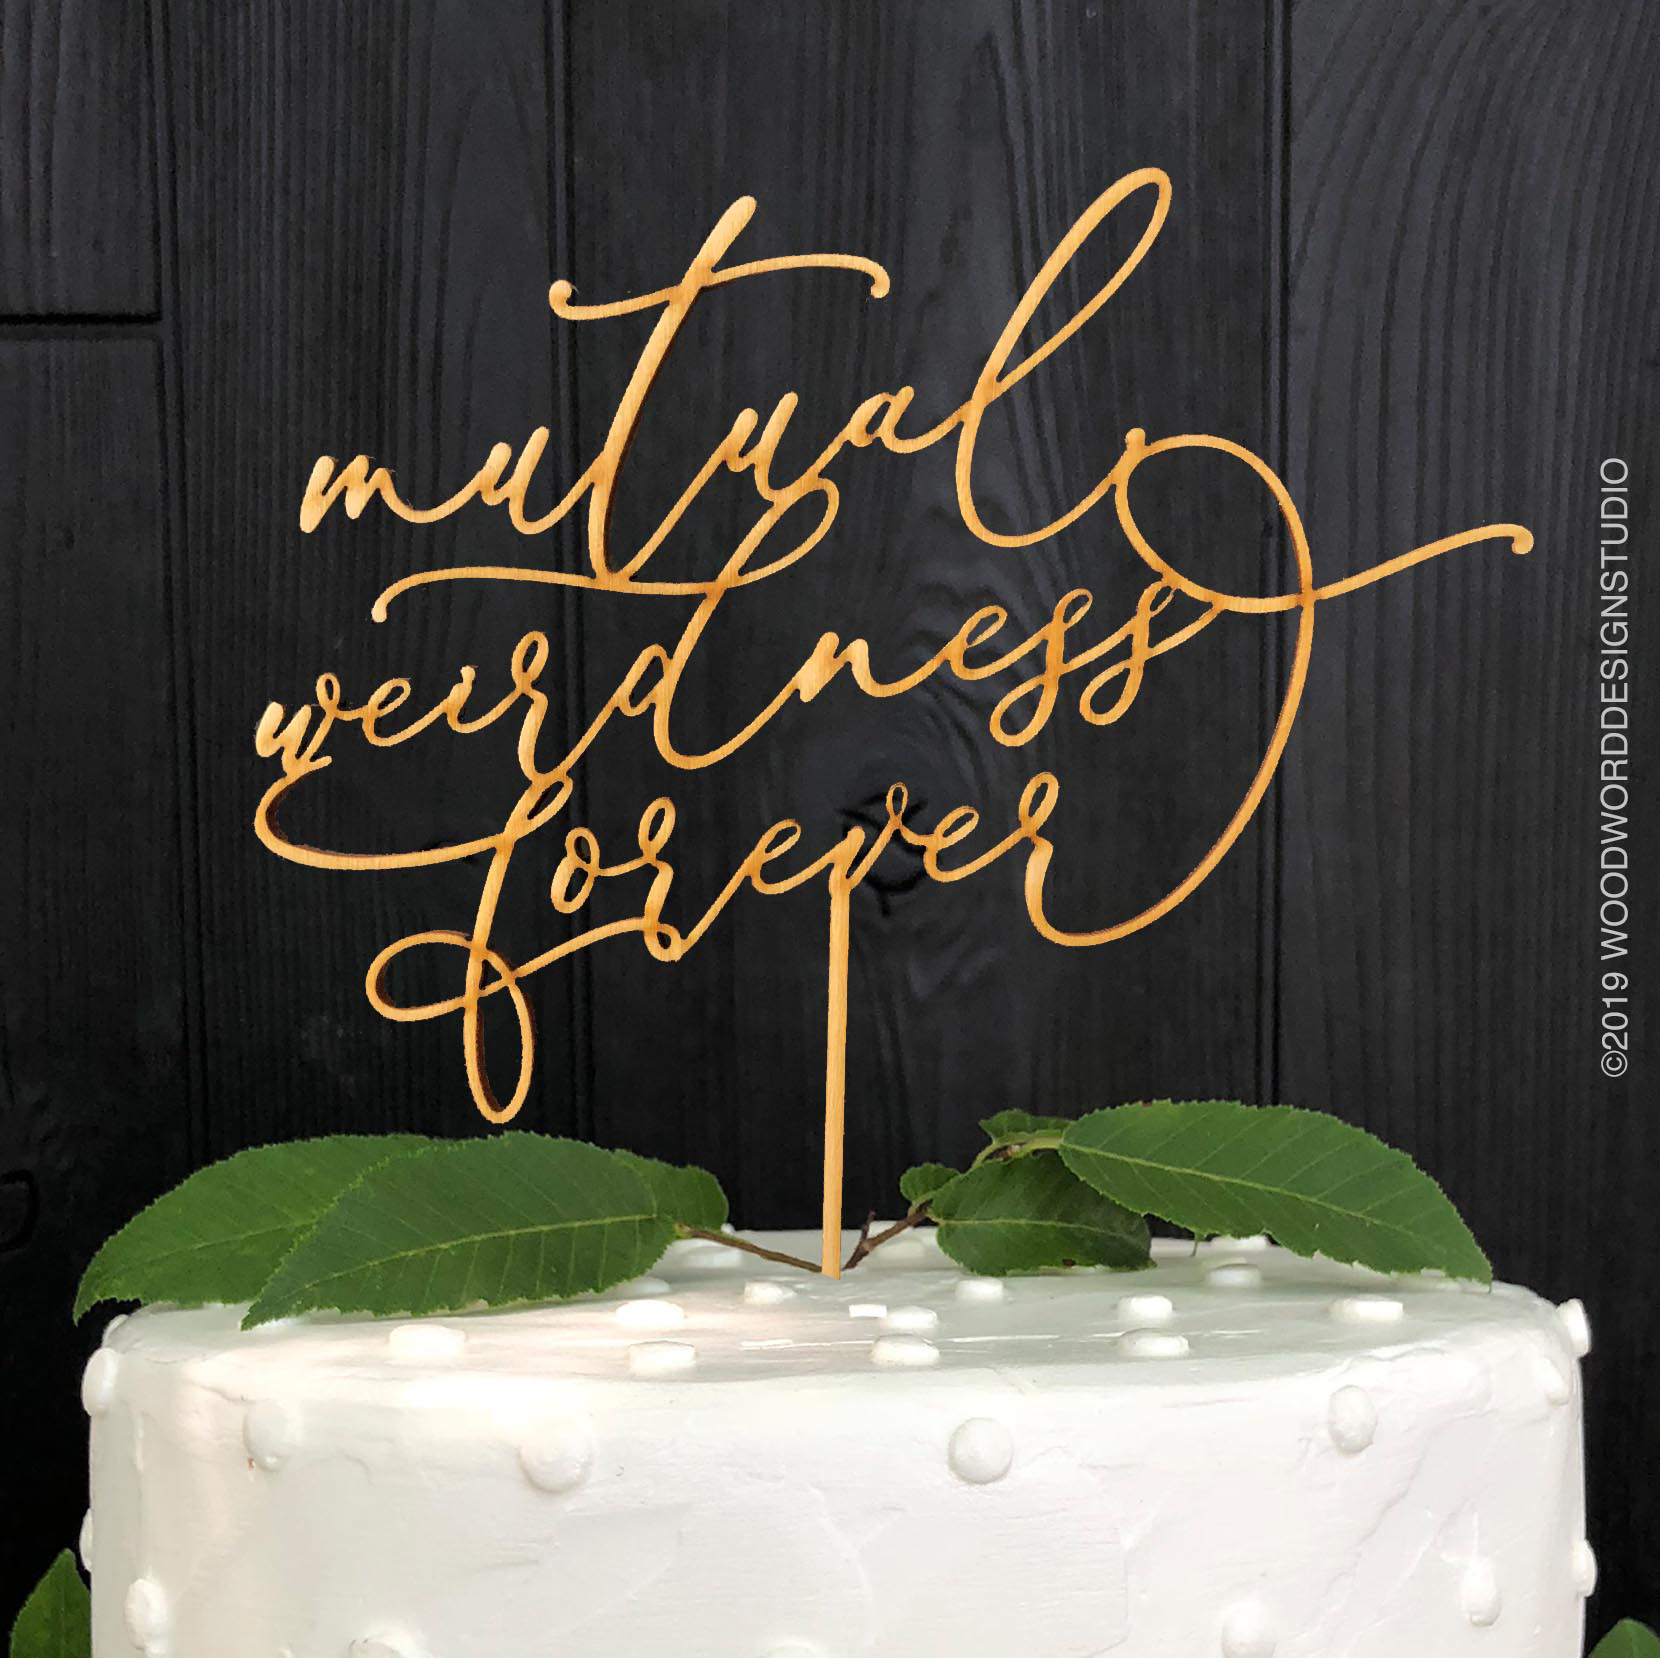 Nerdy Wedding Mutual Weirdness Forever Wedding Cake Topper Woodword Design Studio